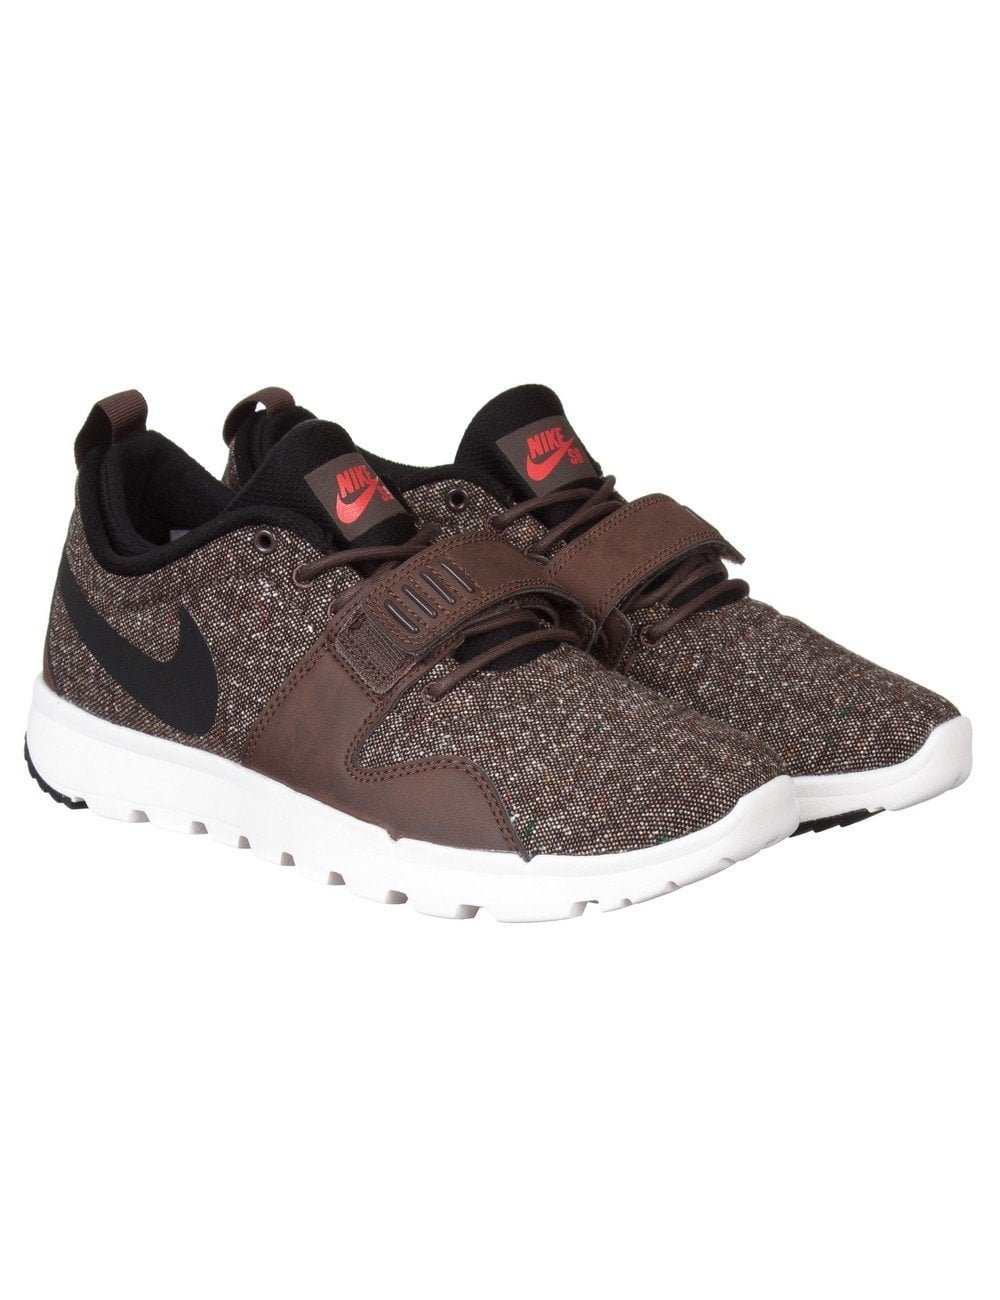 d4afb4fedc58 Nike SB Trainerendor Shoes - BRQ Brown - Footwear from Fat Buddha ...